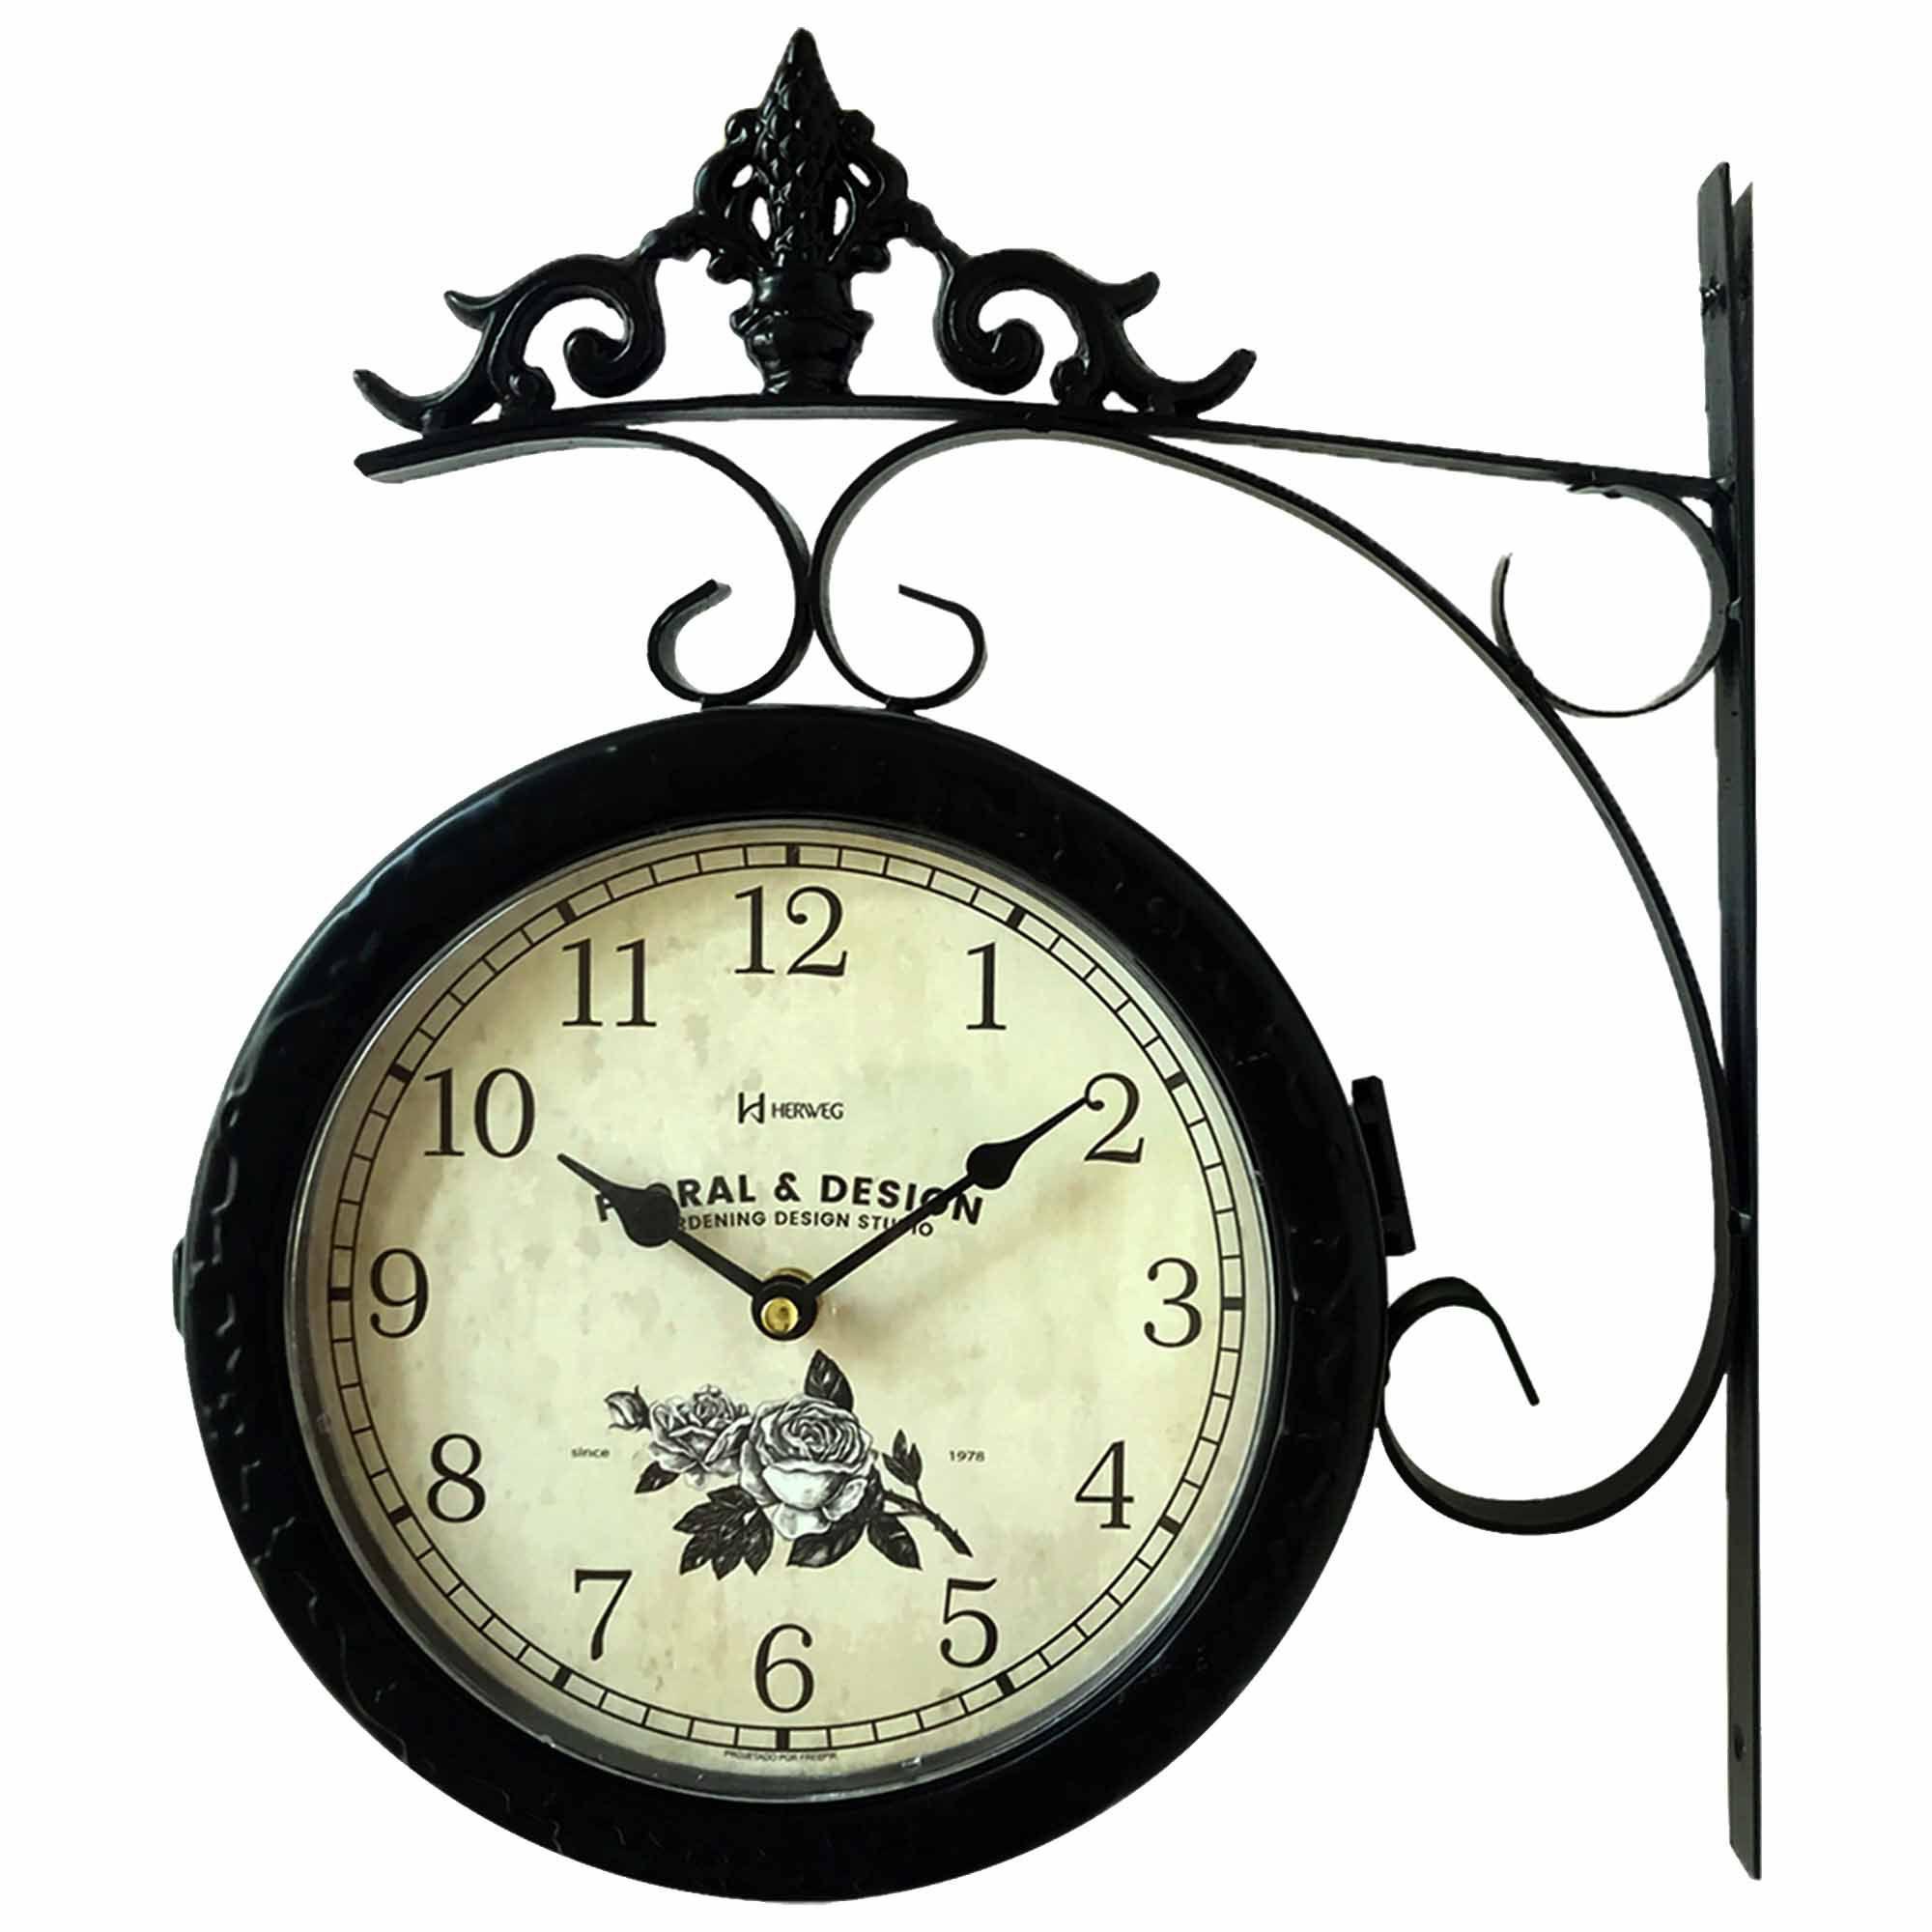 Relógio de Parede Jardim Herweg 6488 034 Preto